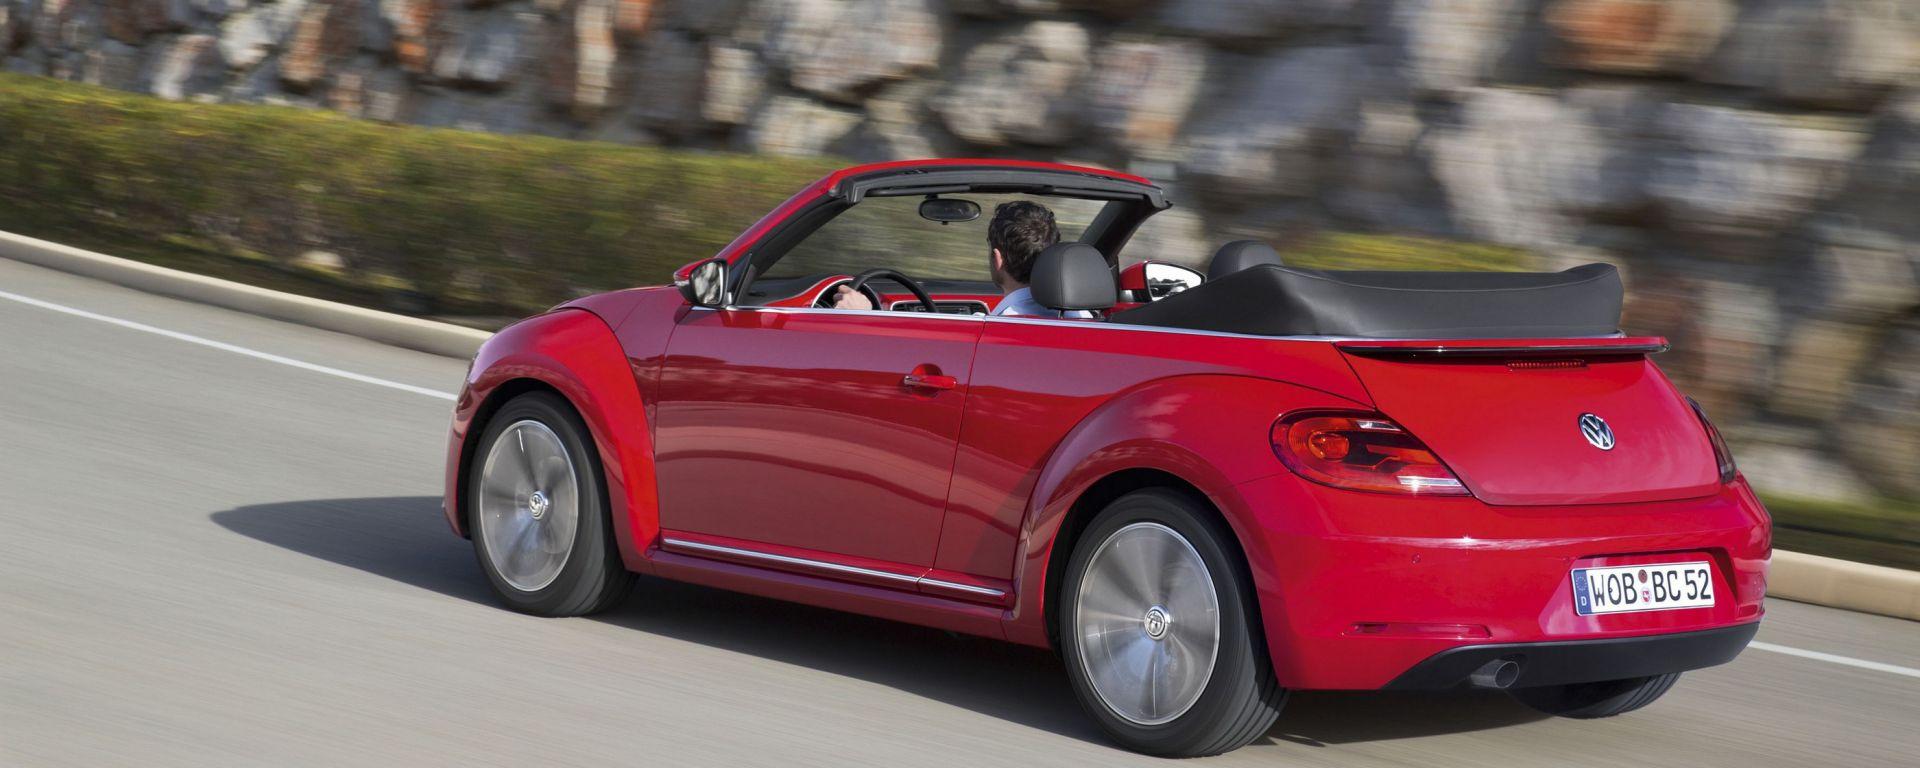 Prova  Volkswagen Maggiolino Cabriolet - MotorBox e3bdfeeaa0b0